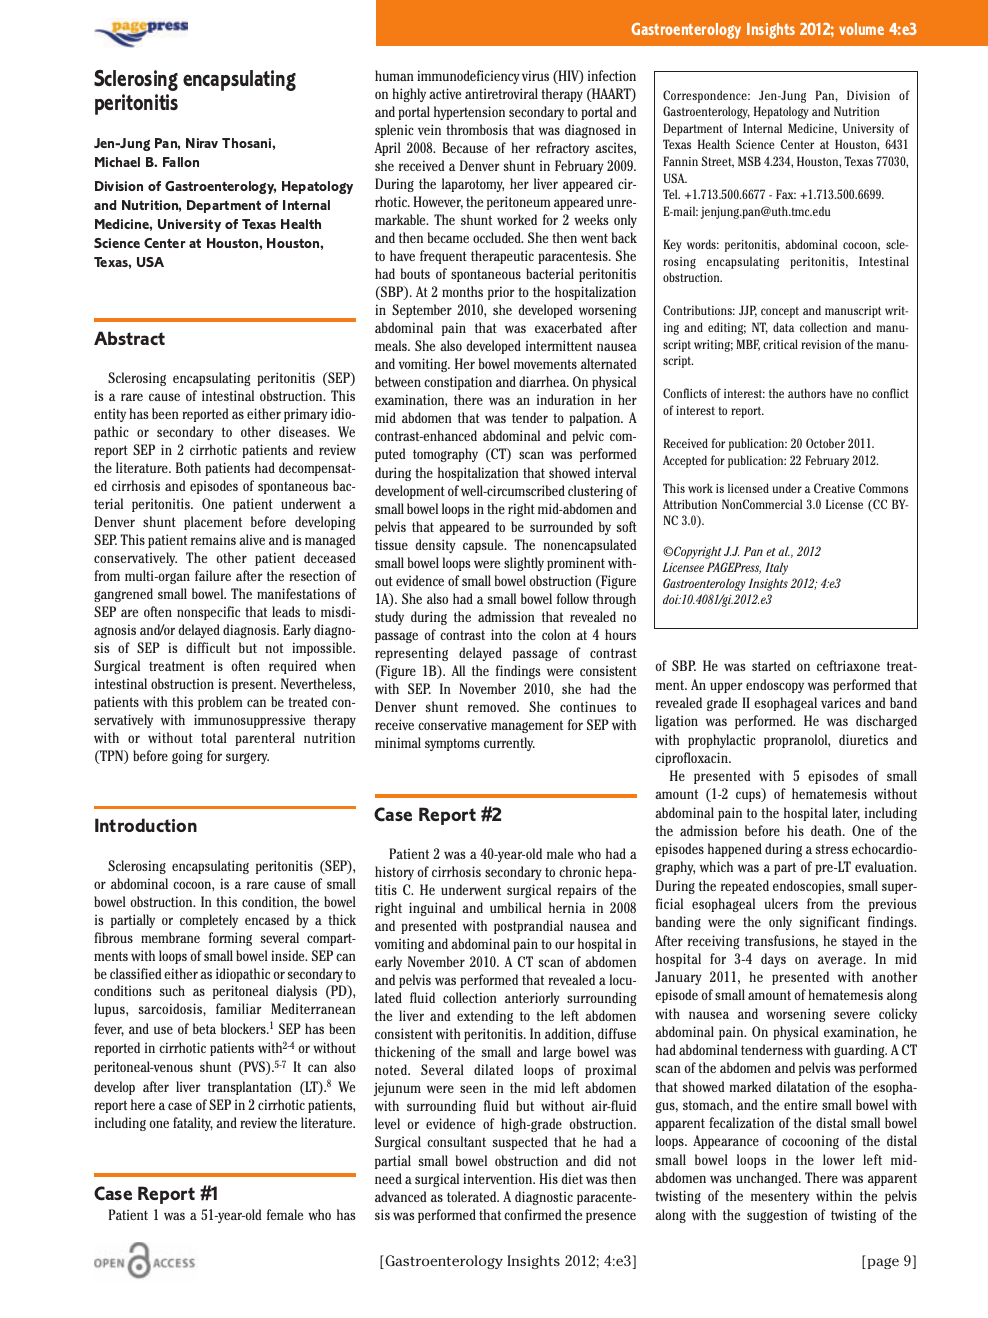 Sclerosing encapsulating peritonitis – topic of research